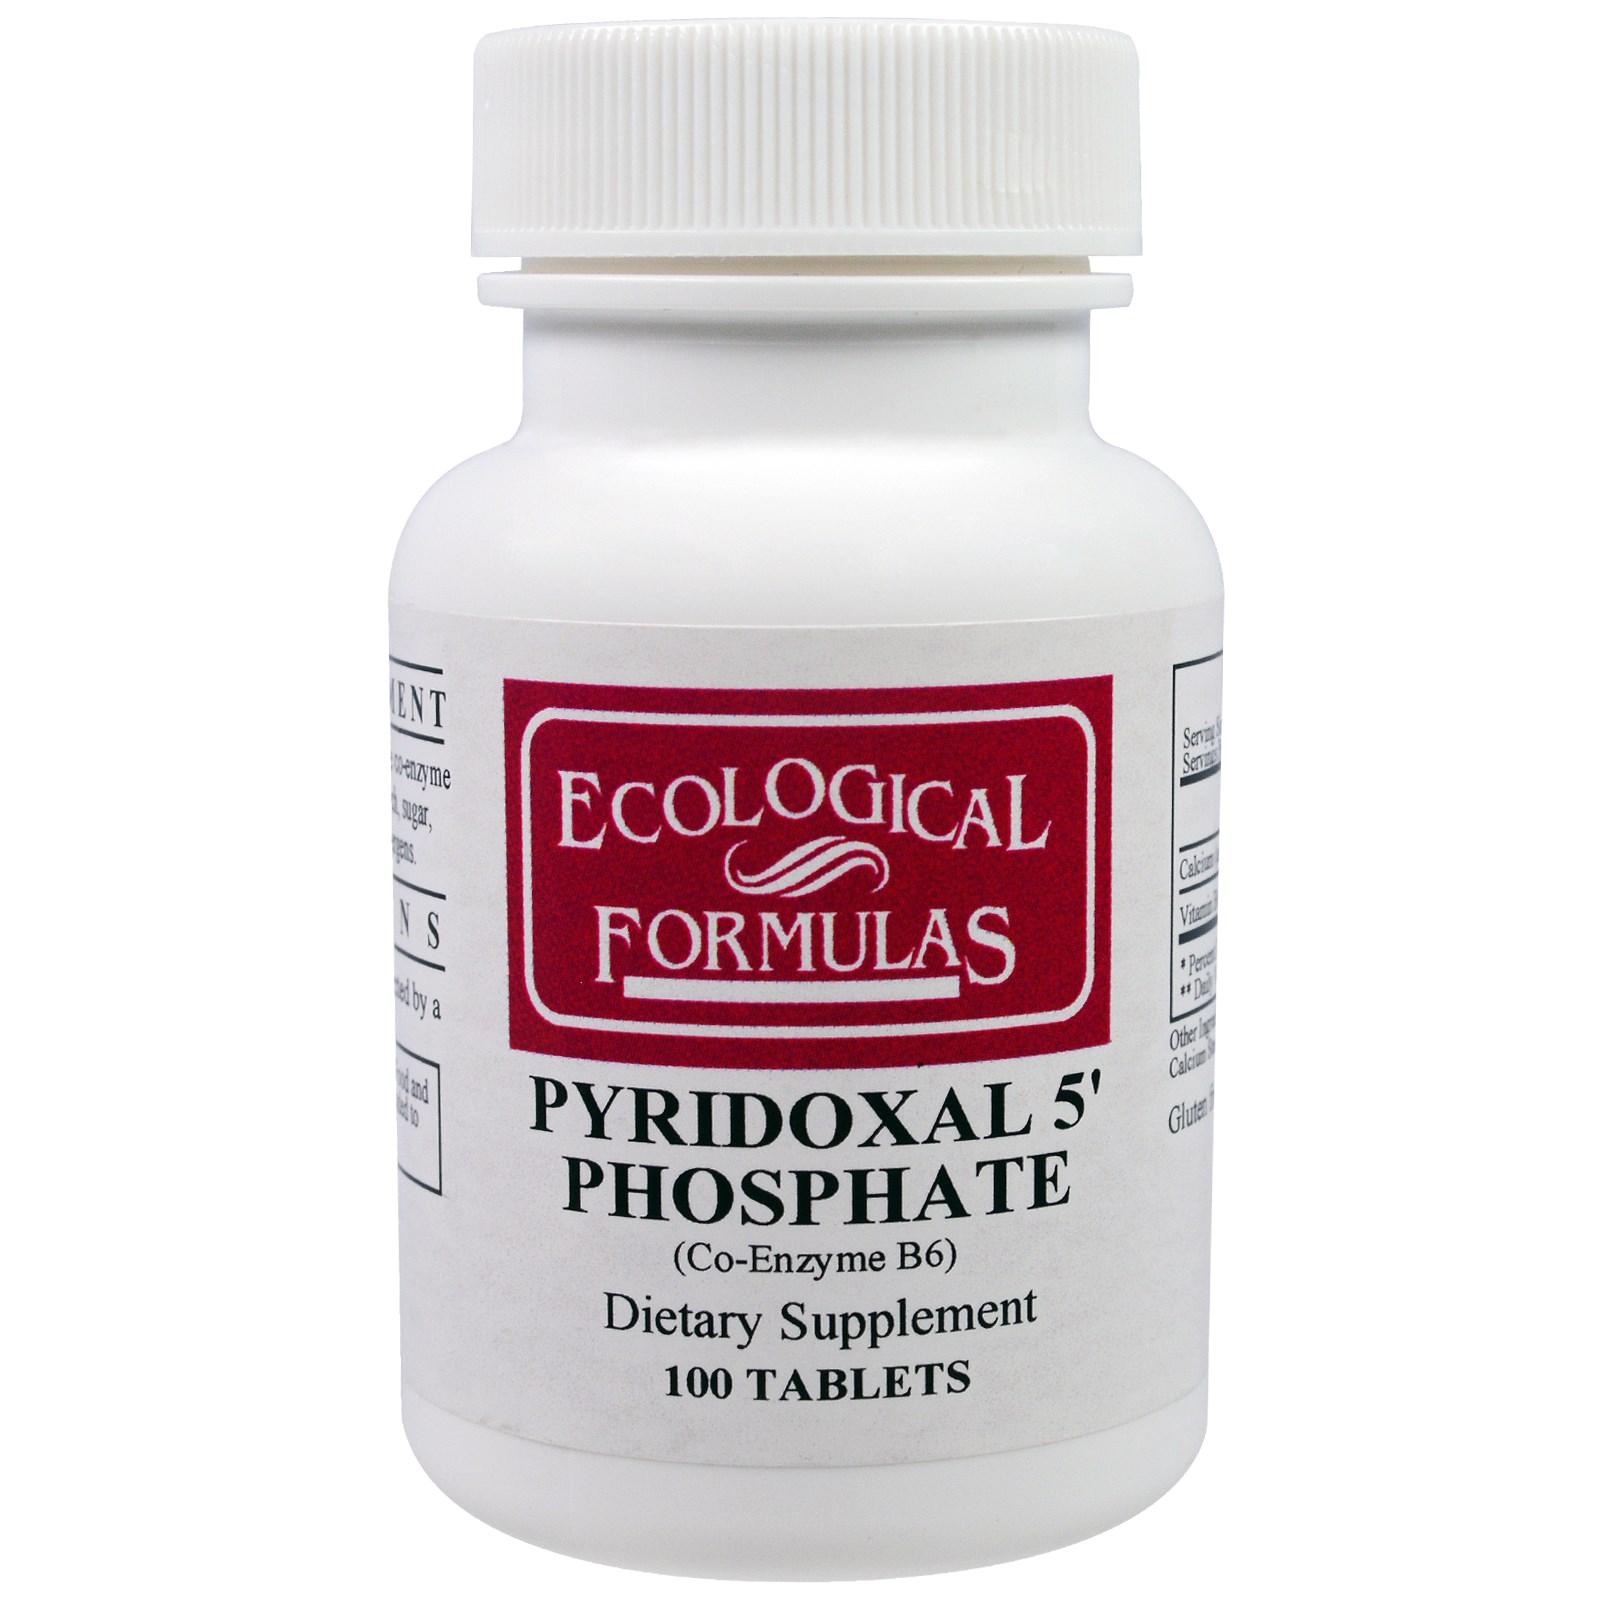 Cardiovascular Research Ltd., Пиридоксаль-5-фосфат, 100 таблеток